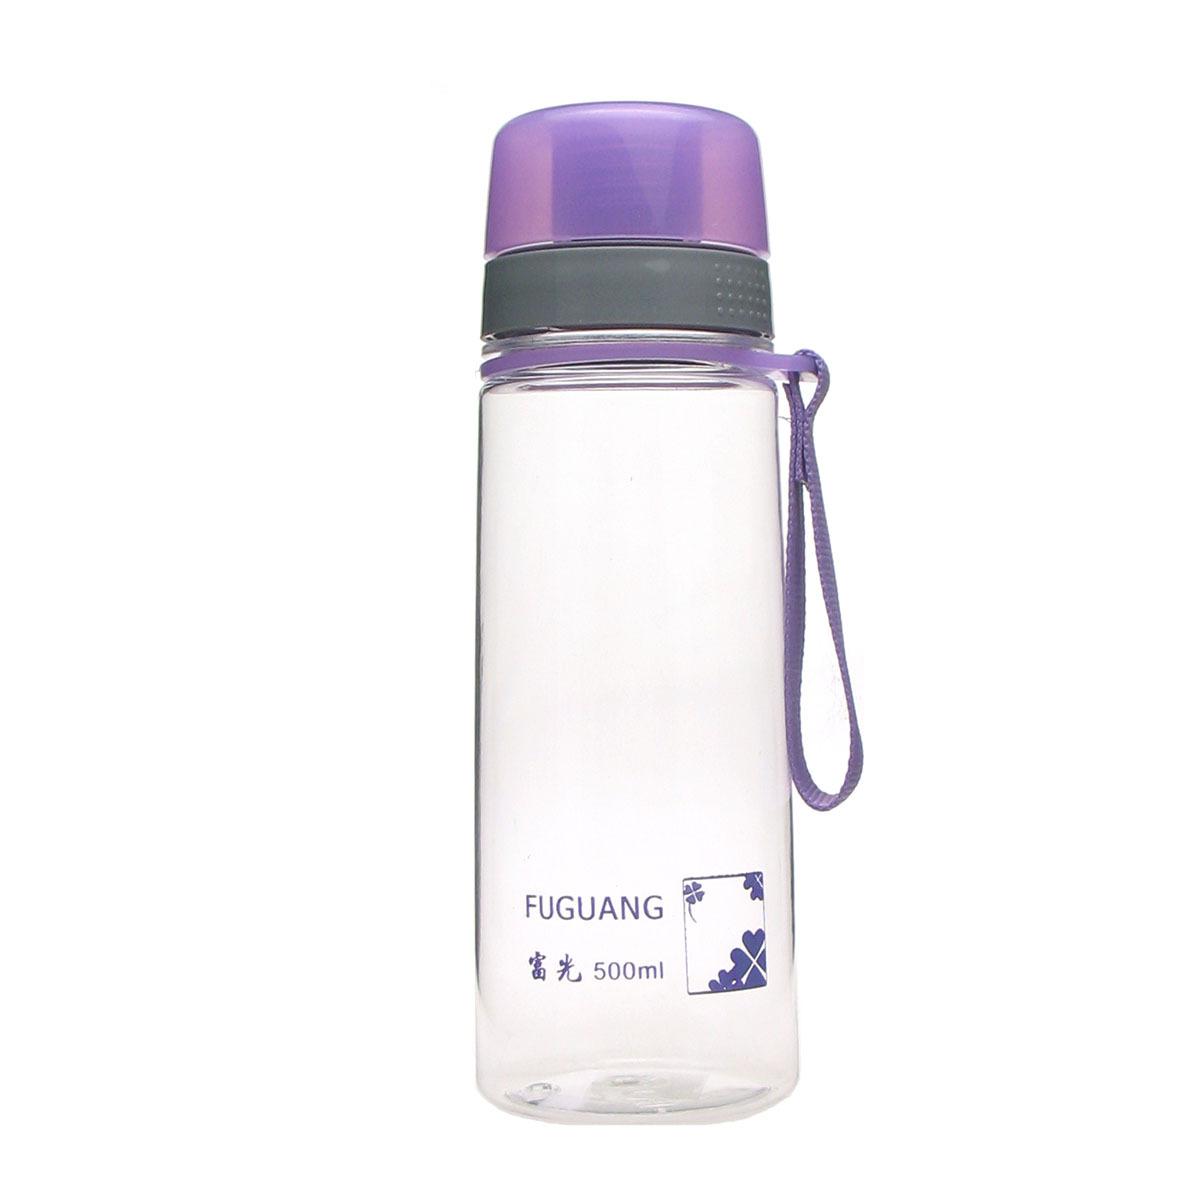 Спортивная бутылка Tomimitsu fga123/500 FGA123-500 500ml PC Другой стиль 401-500 мл